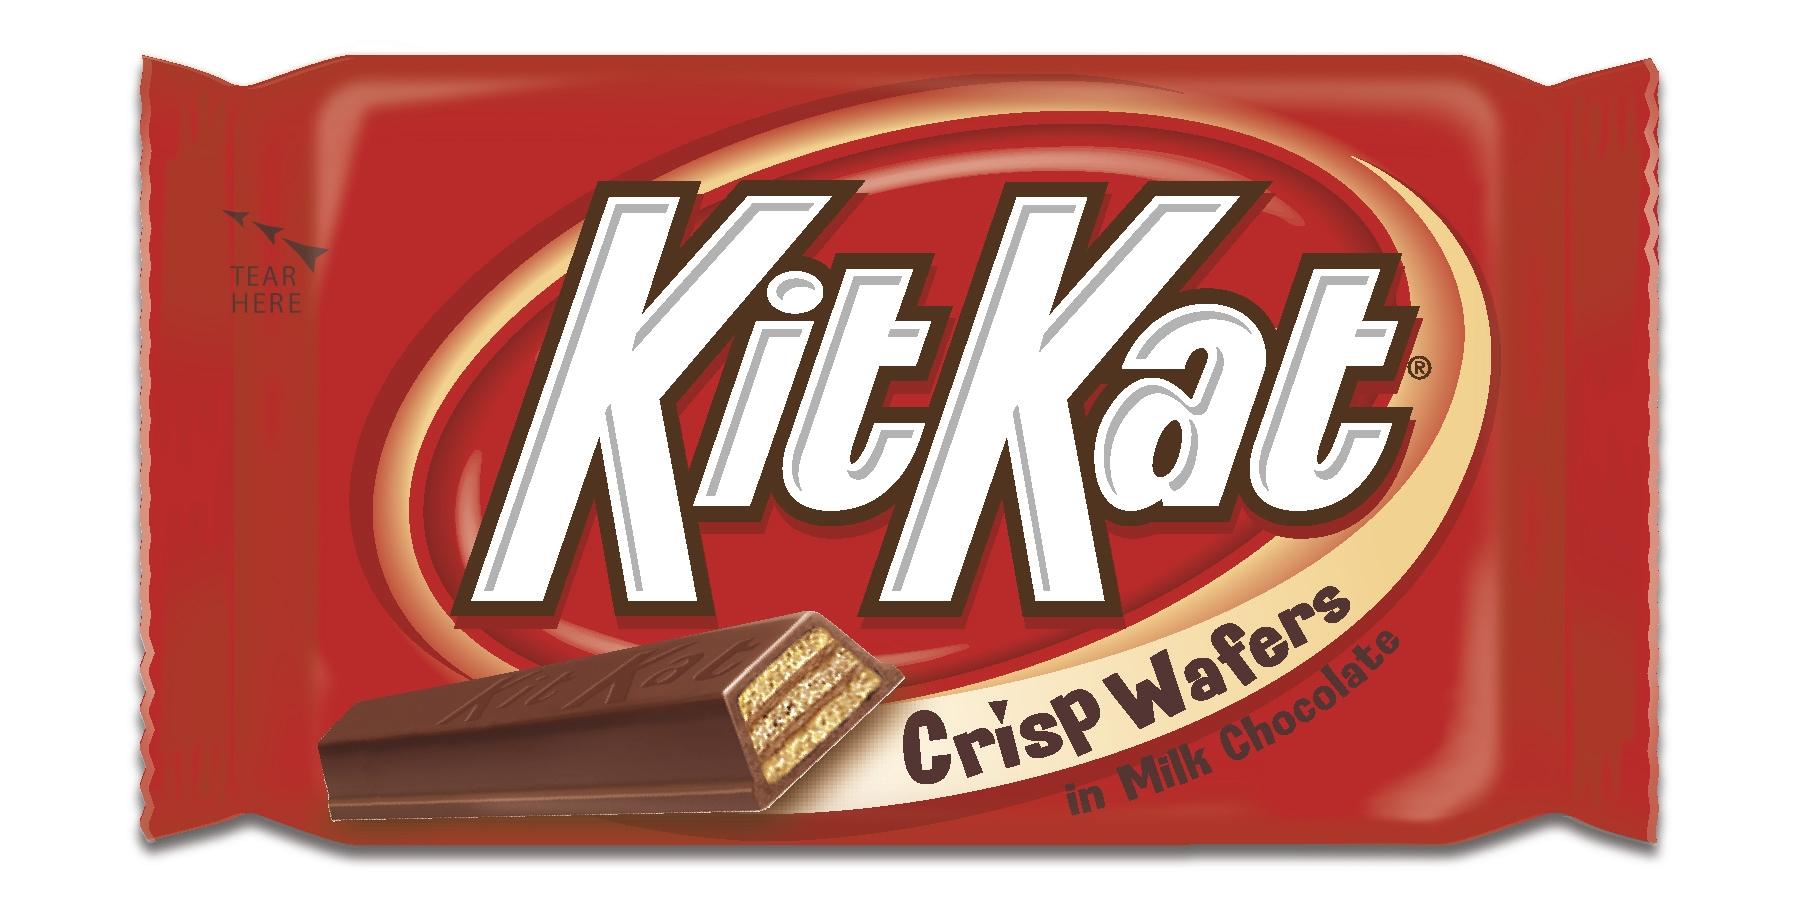 kit-kat-logo.jpg